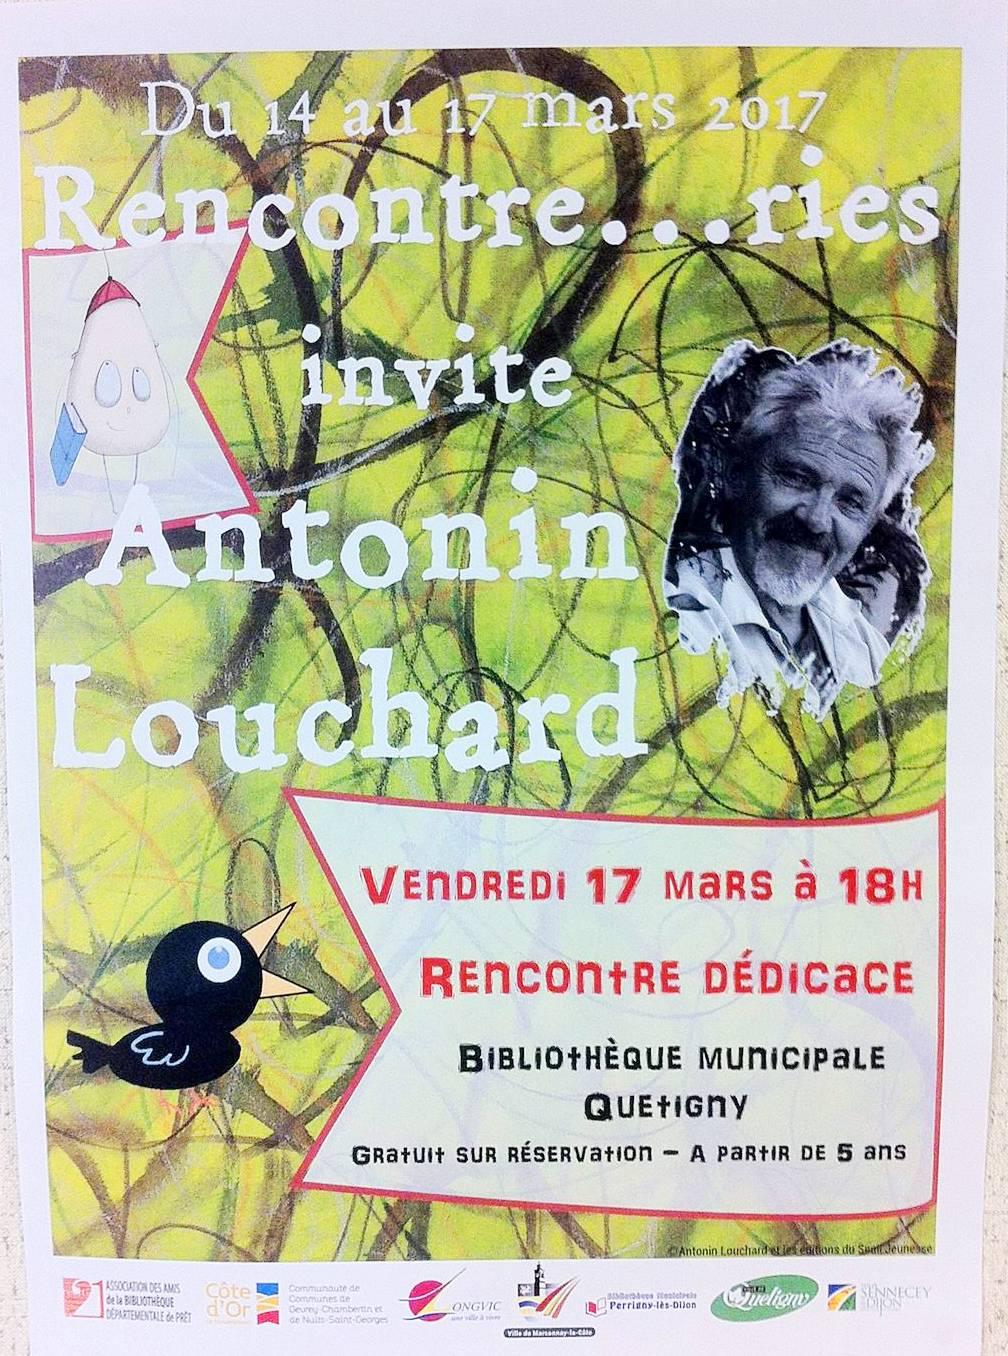 Louchard 01.jpg